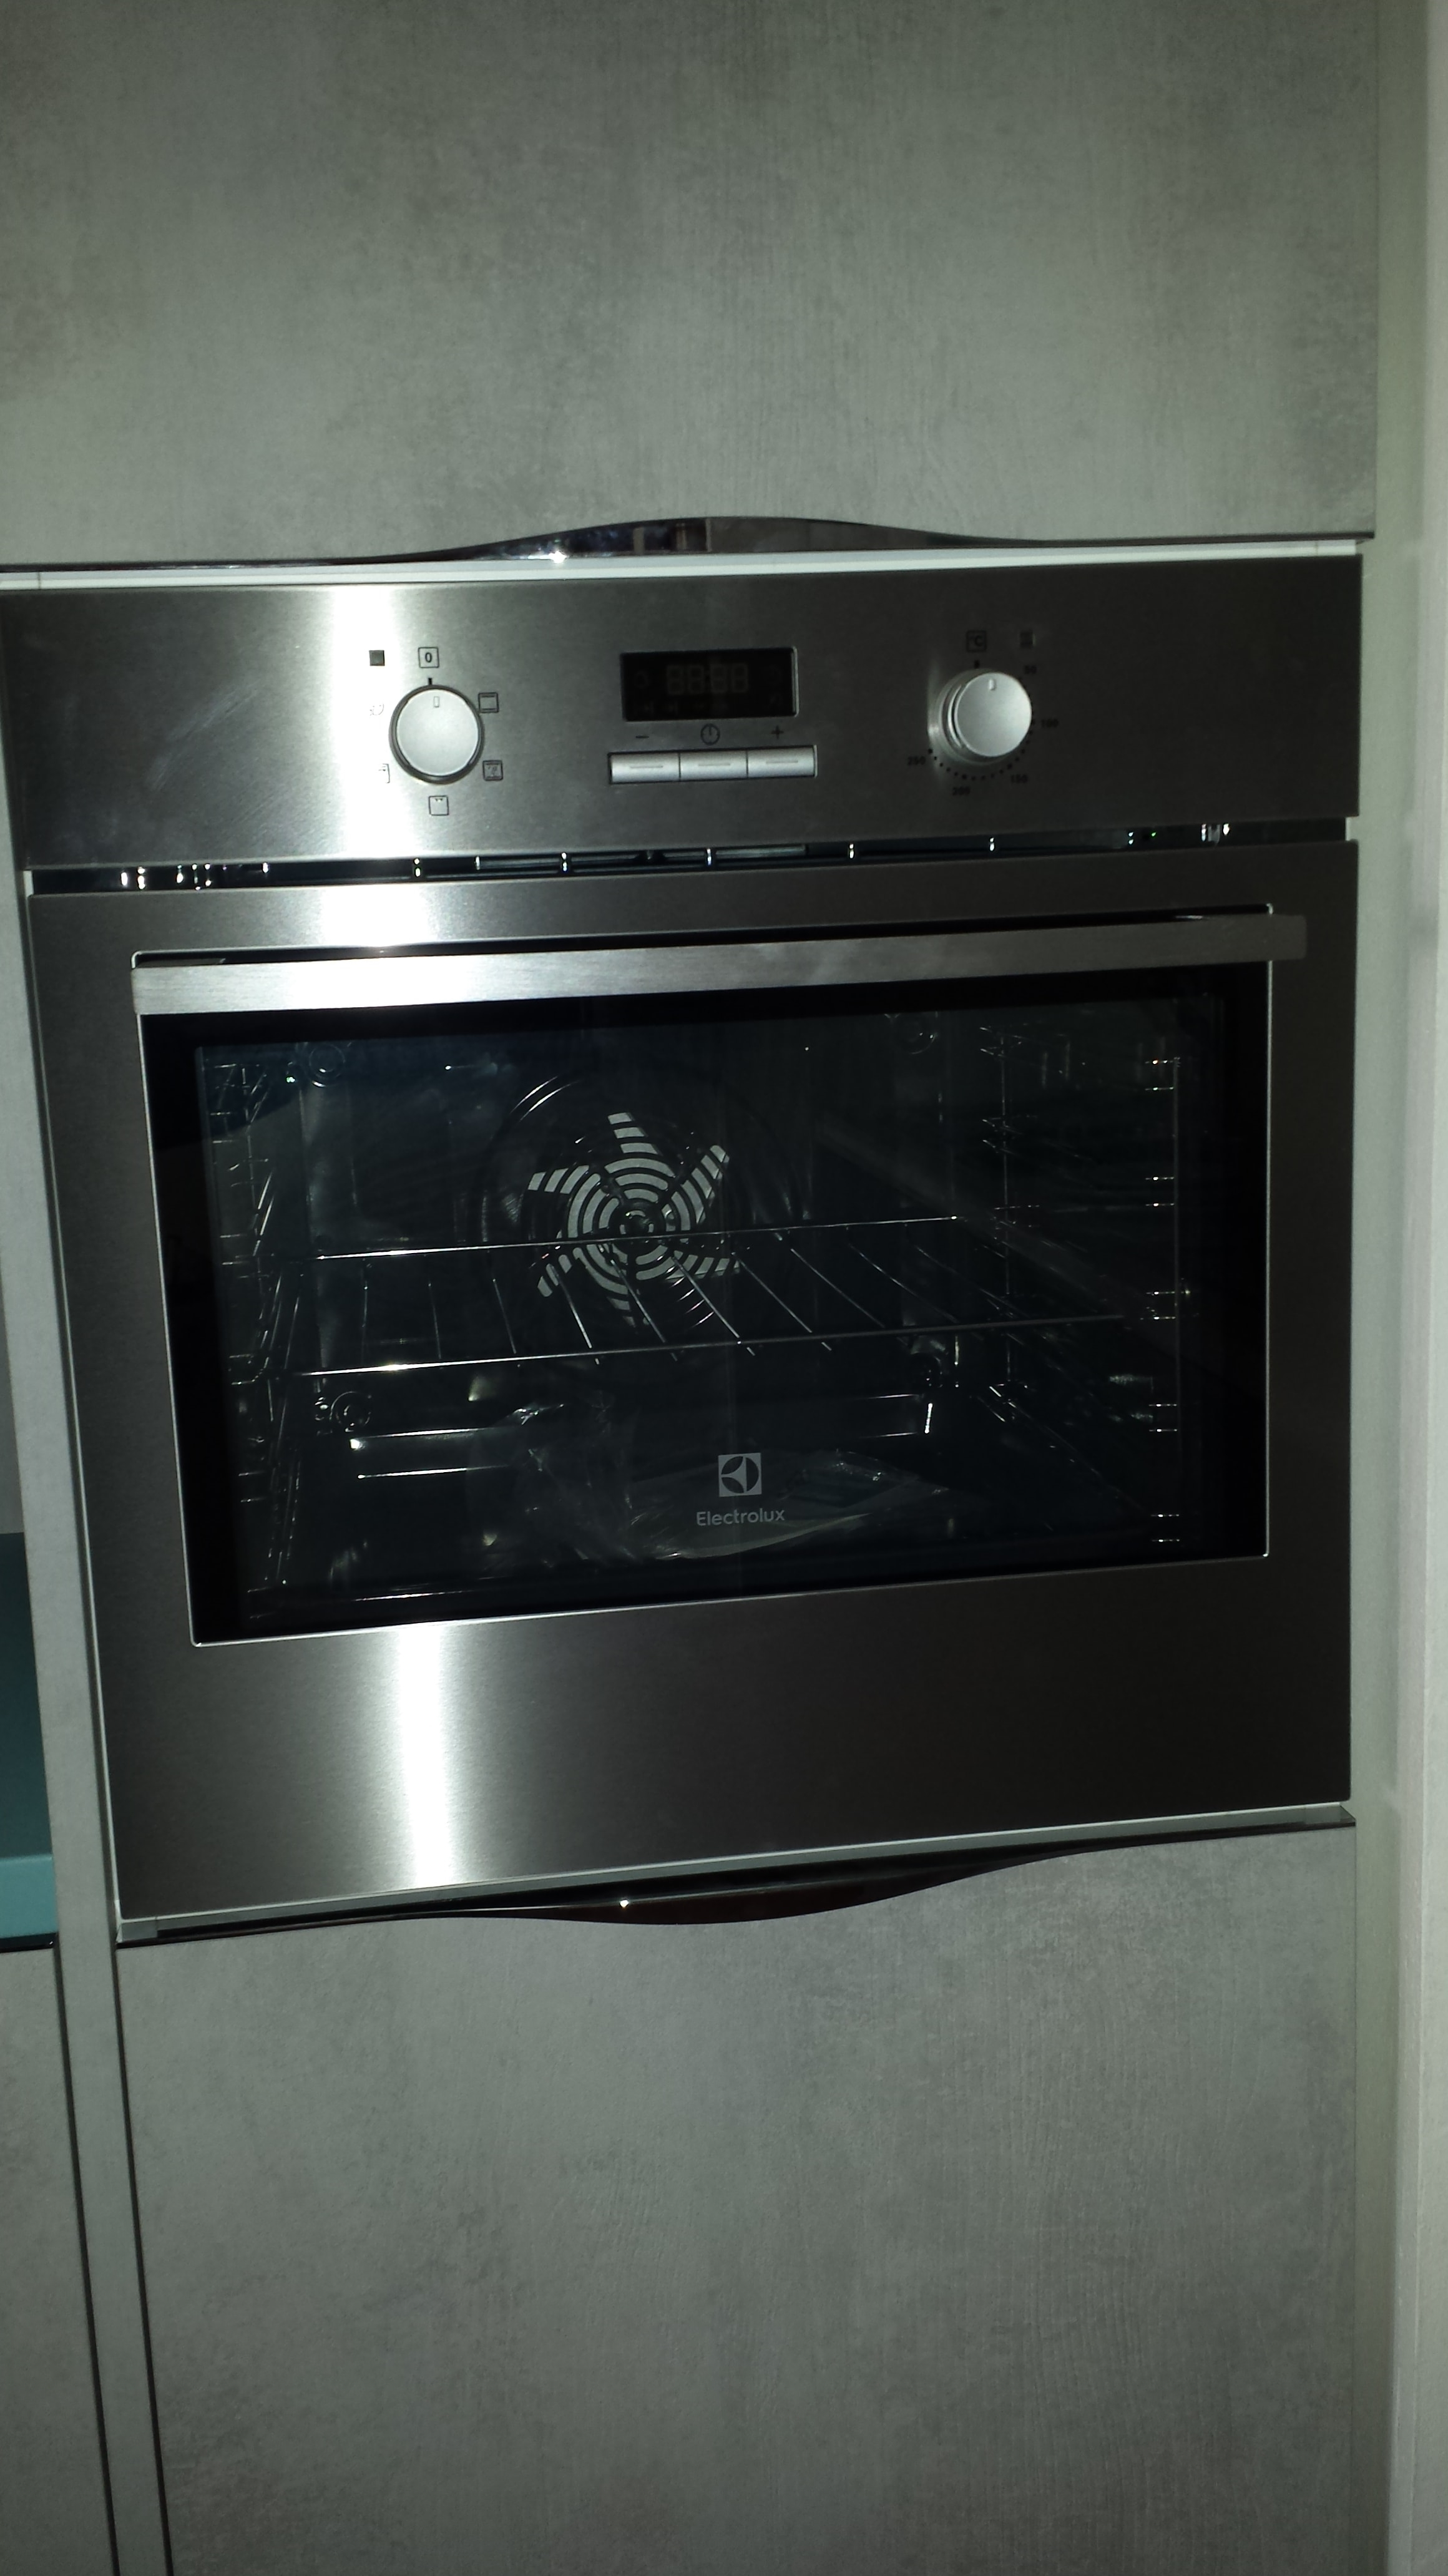 Cucina Immagina Head di Lube Cucine a prezzo Outlet - Cucine a ...